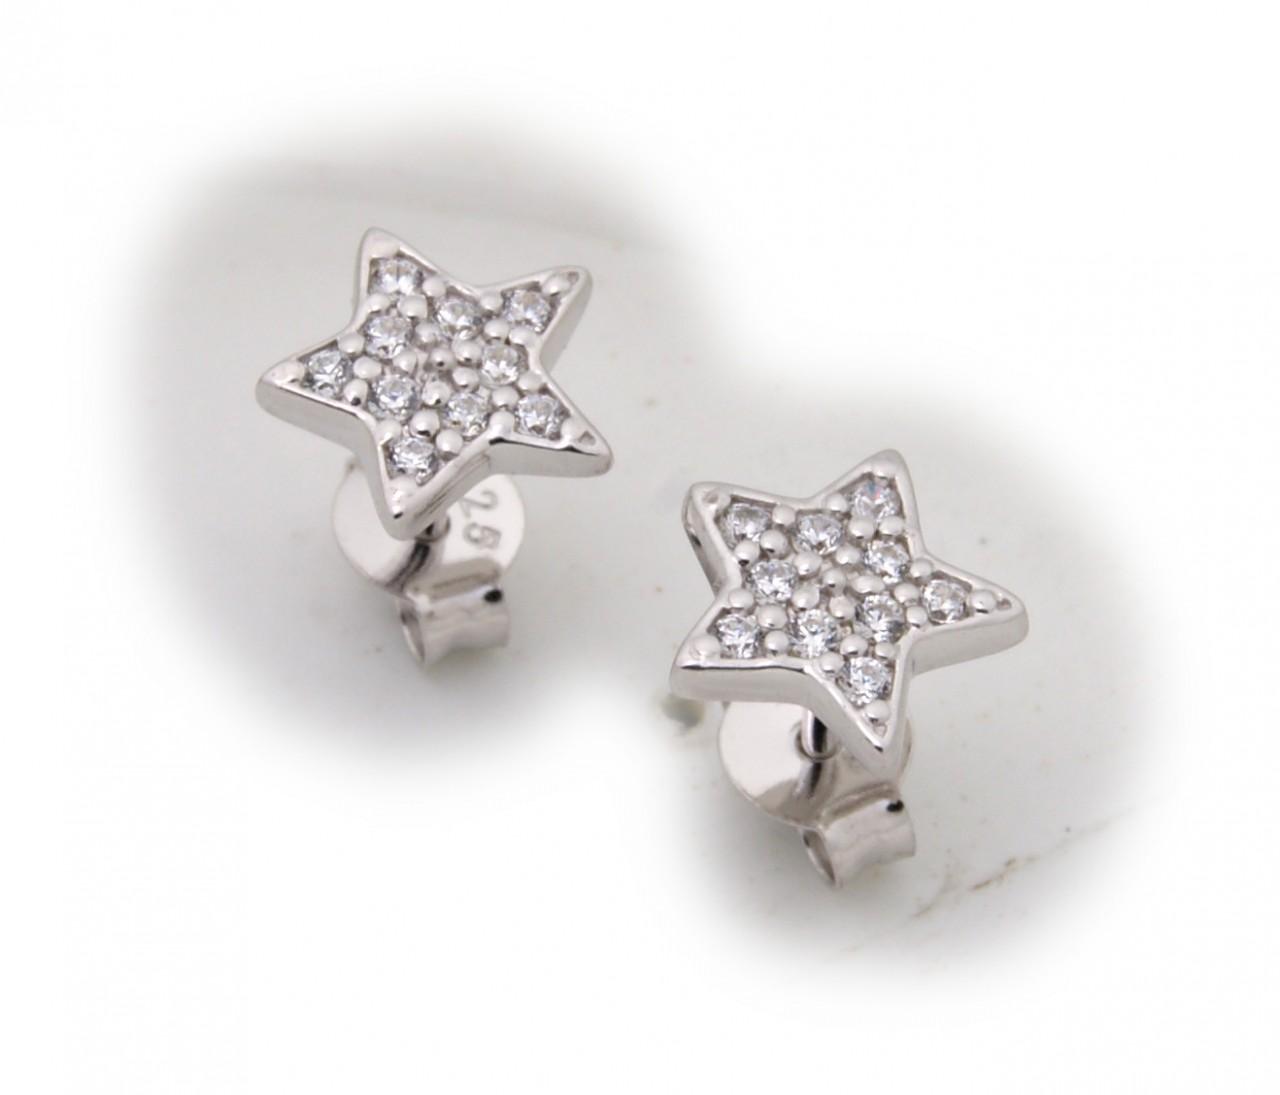 Damen Ohrringe Stern Zirkonia echt Silber 925 Sterlingsilber Ohrstecker Stecker Sternform